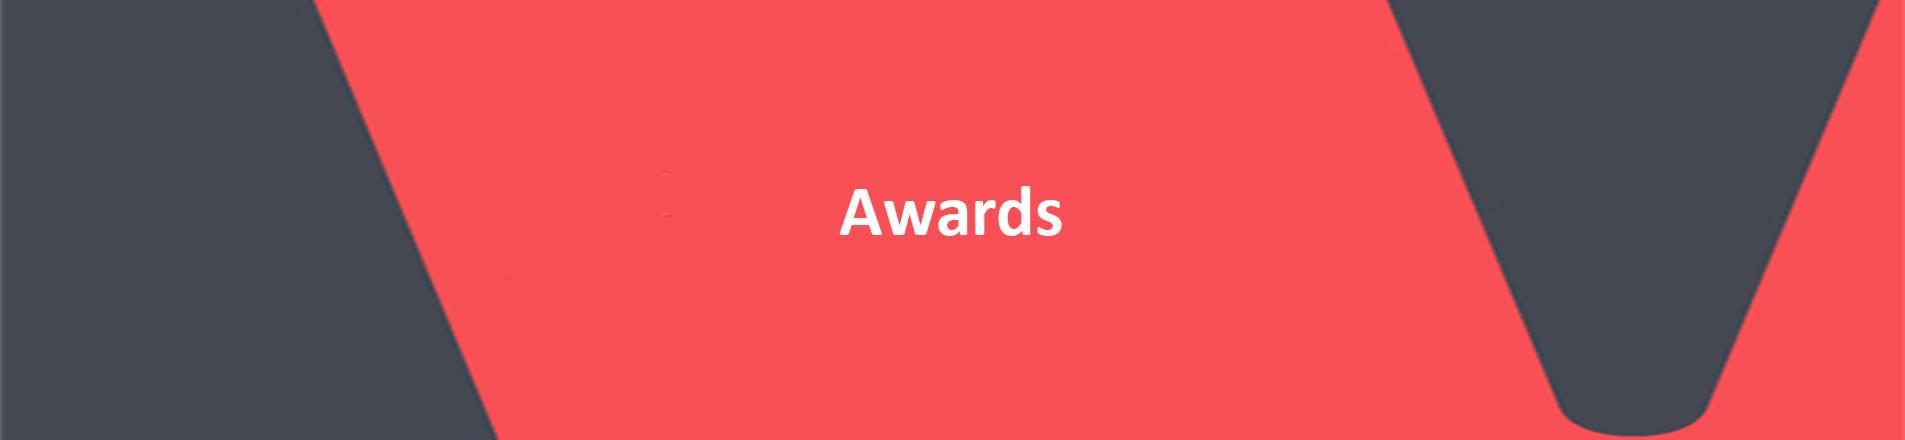 Word awards on red VERCIDA branded background